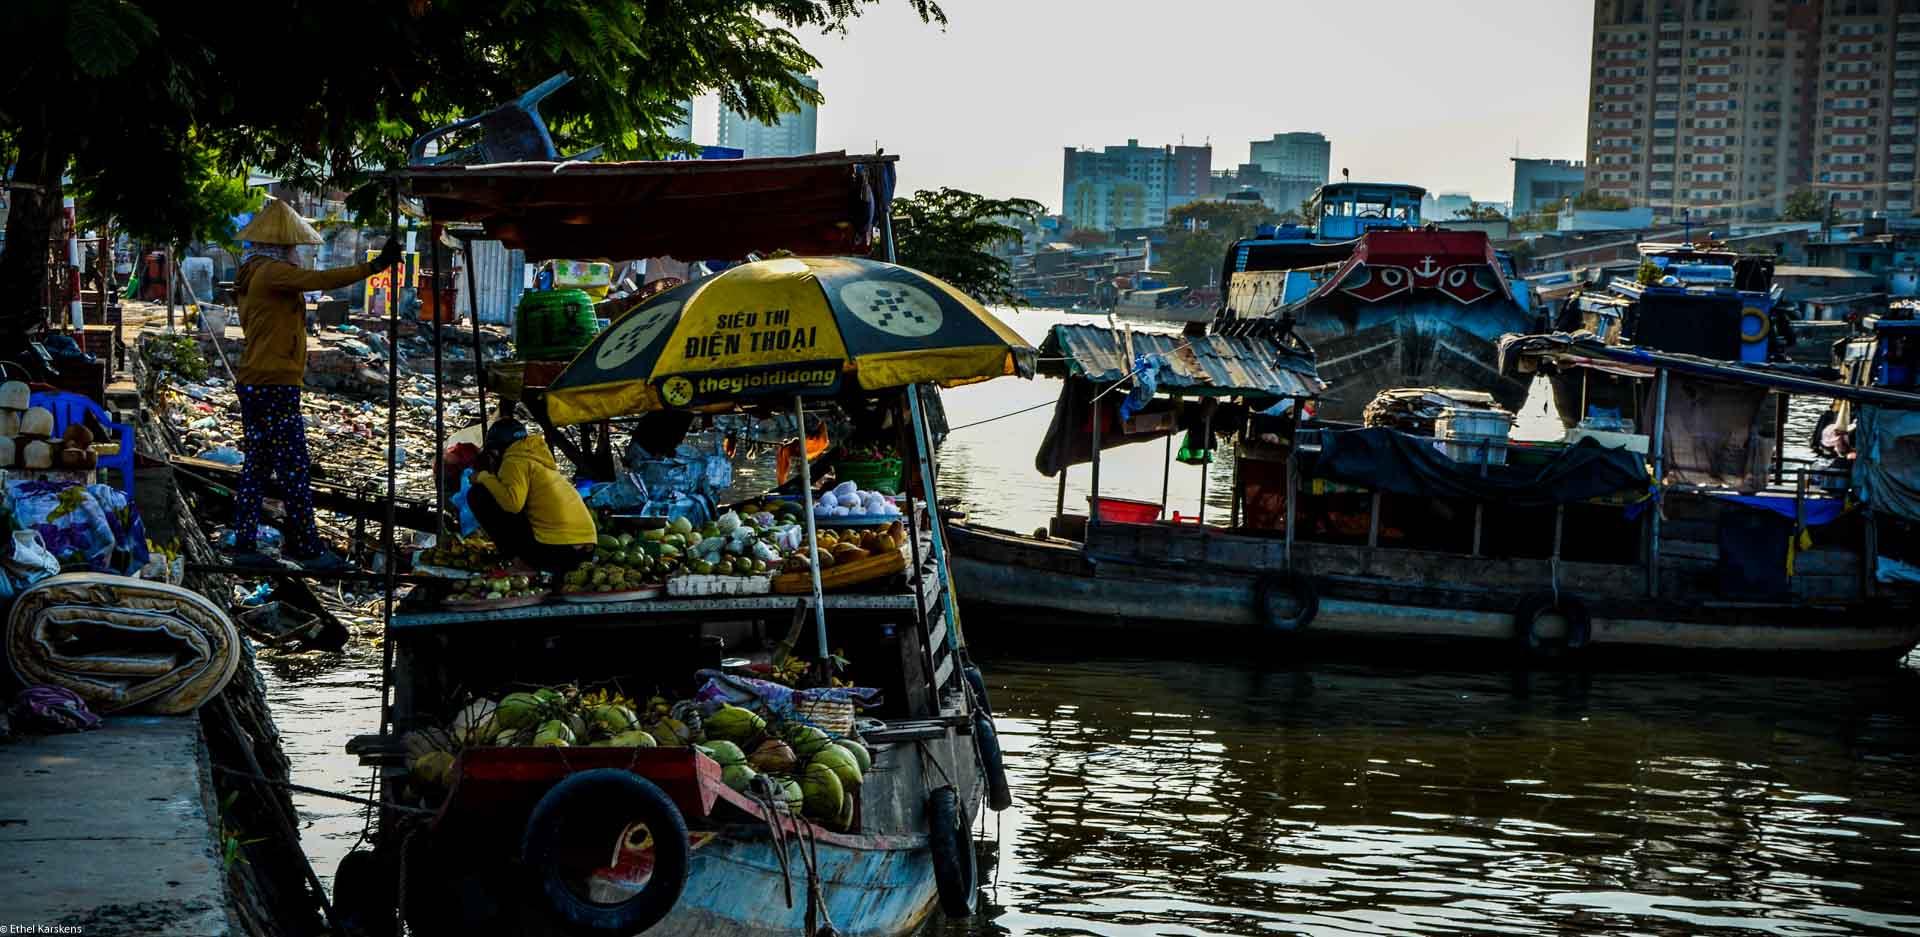 Women talking on the boat, Saigon